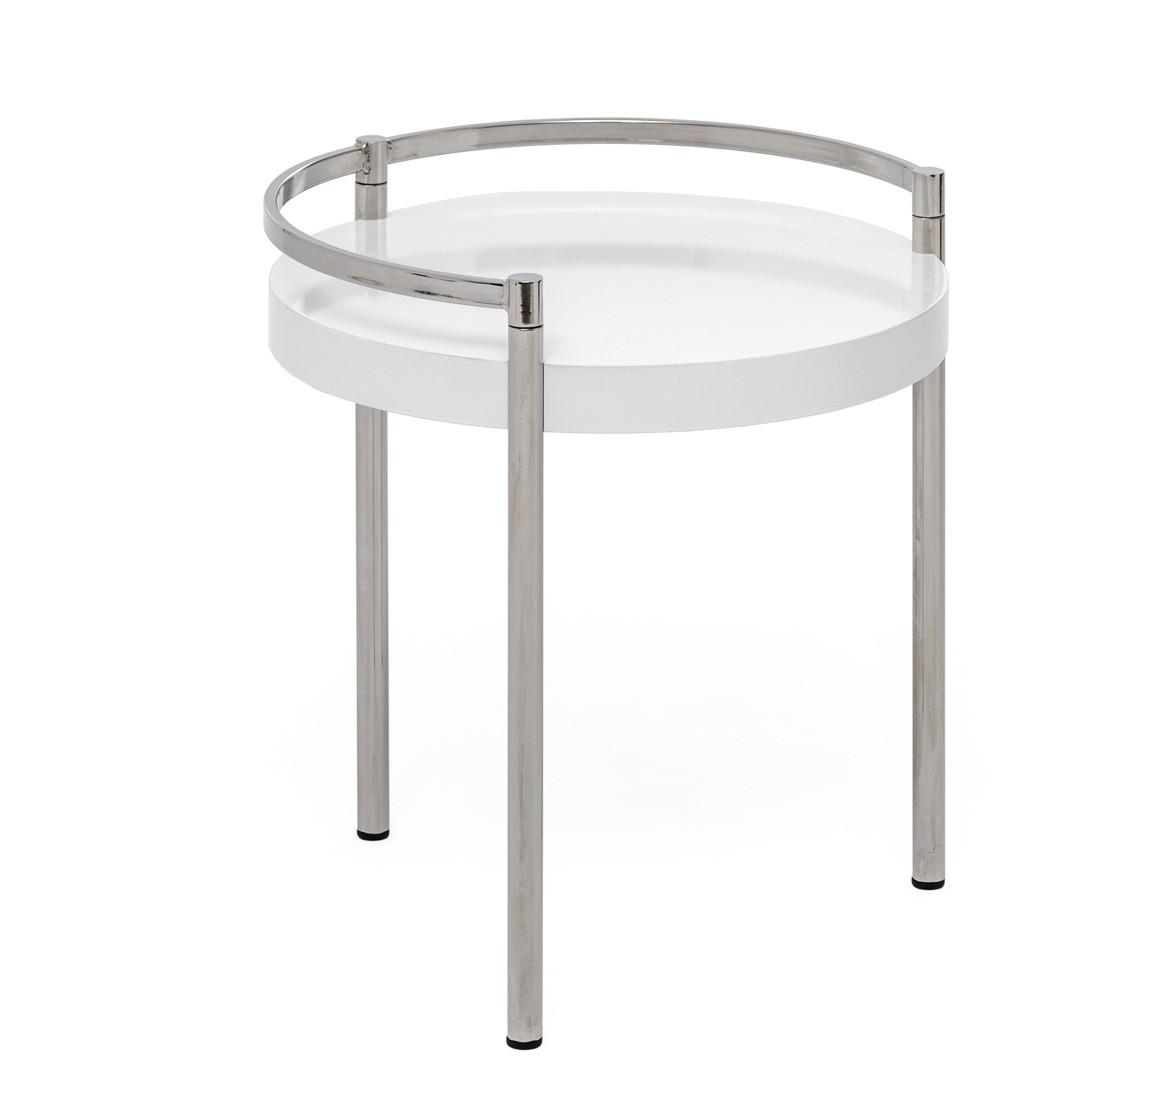 Стол кофейный TABULA 0MAR010500 01 10 / T Белый